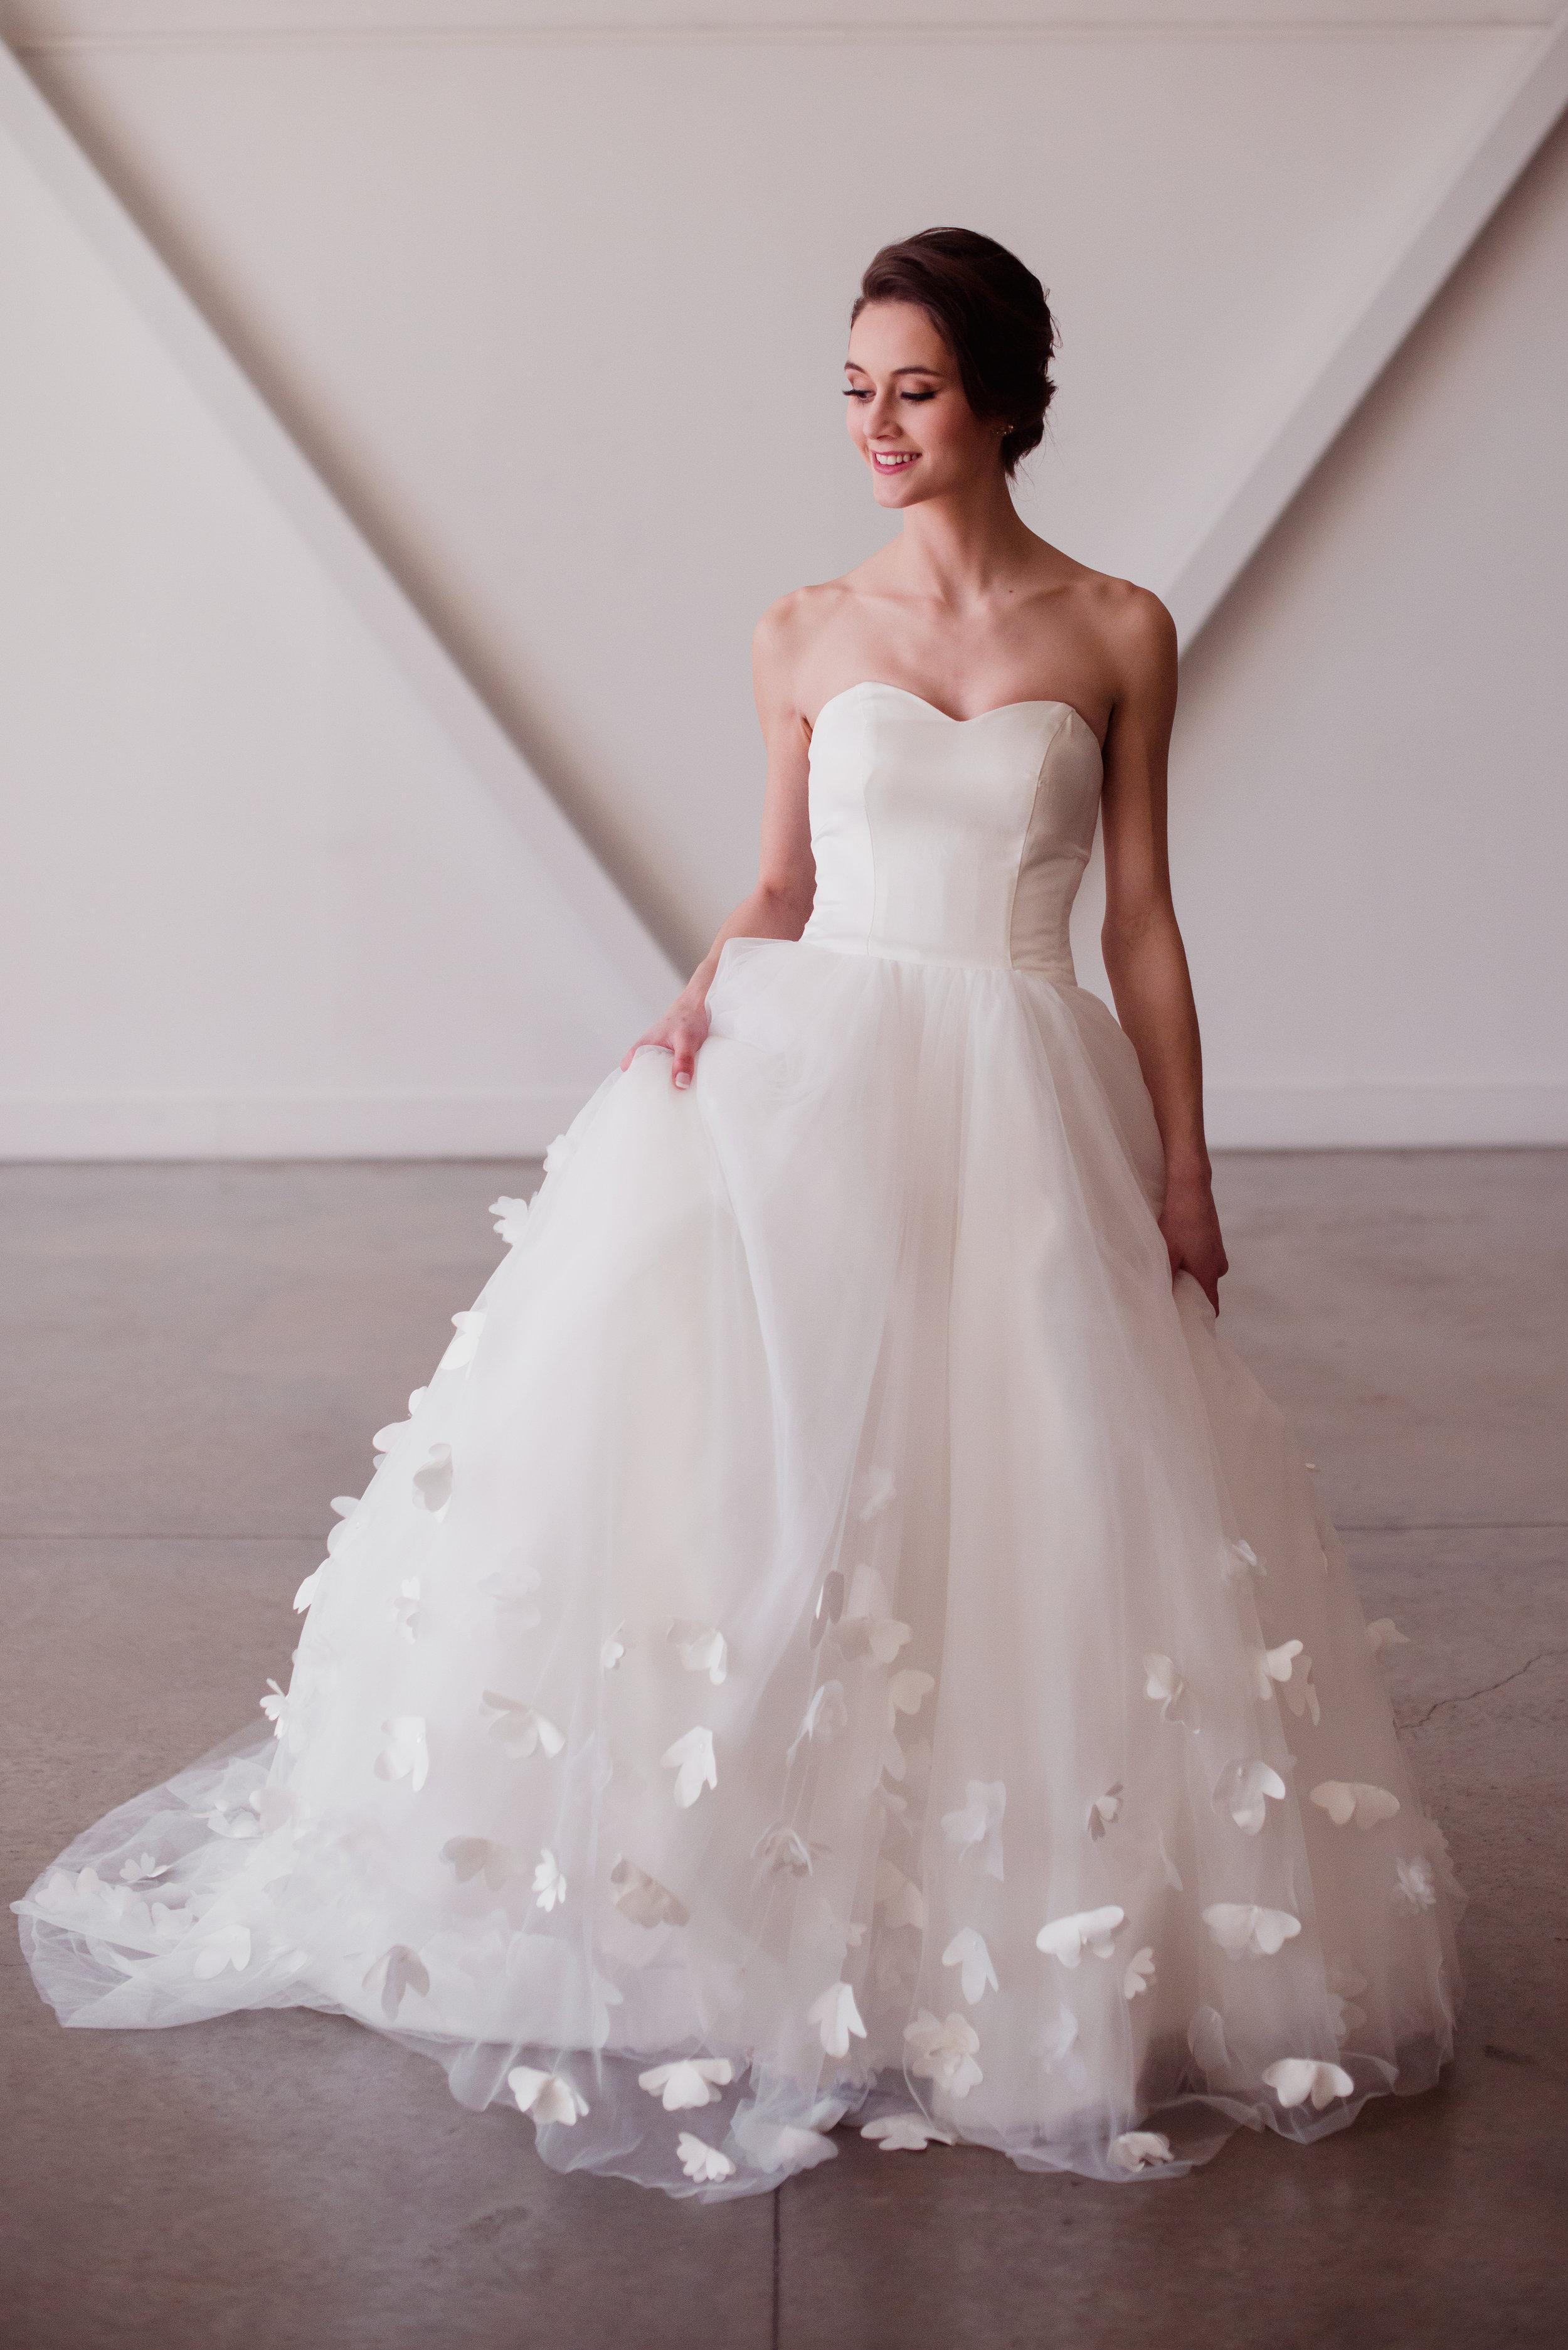 simple modern wedding dress 3D floral applique ballgown fit sweetheart tube tup dress